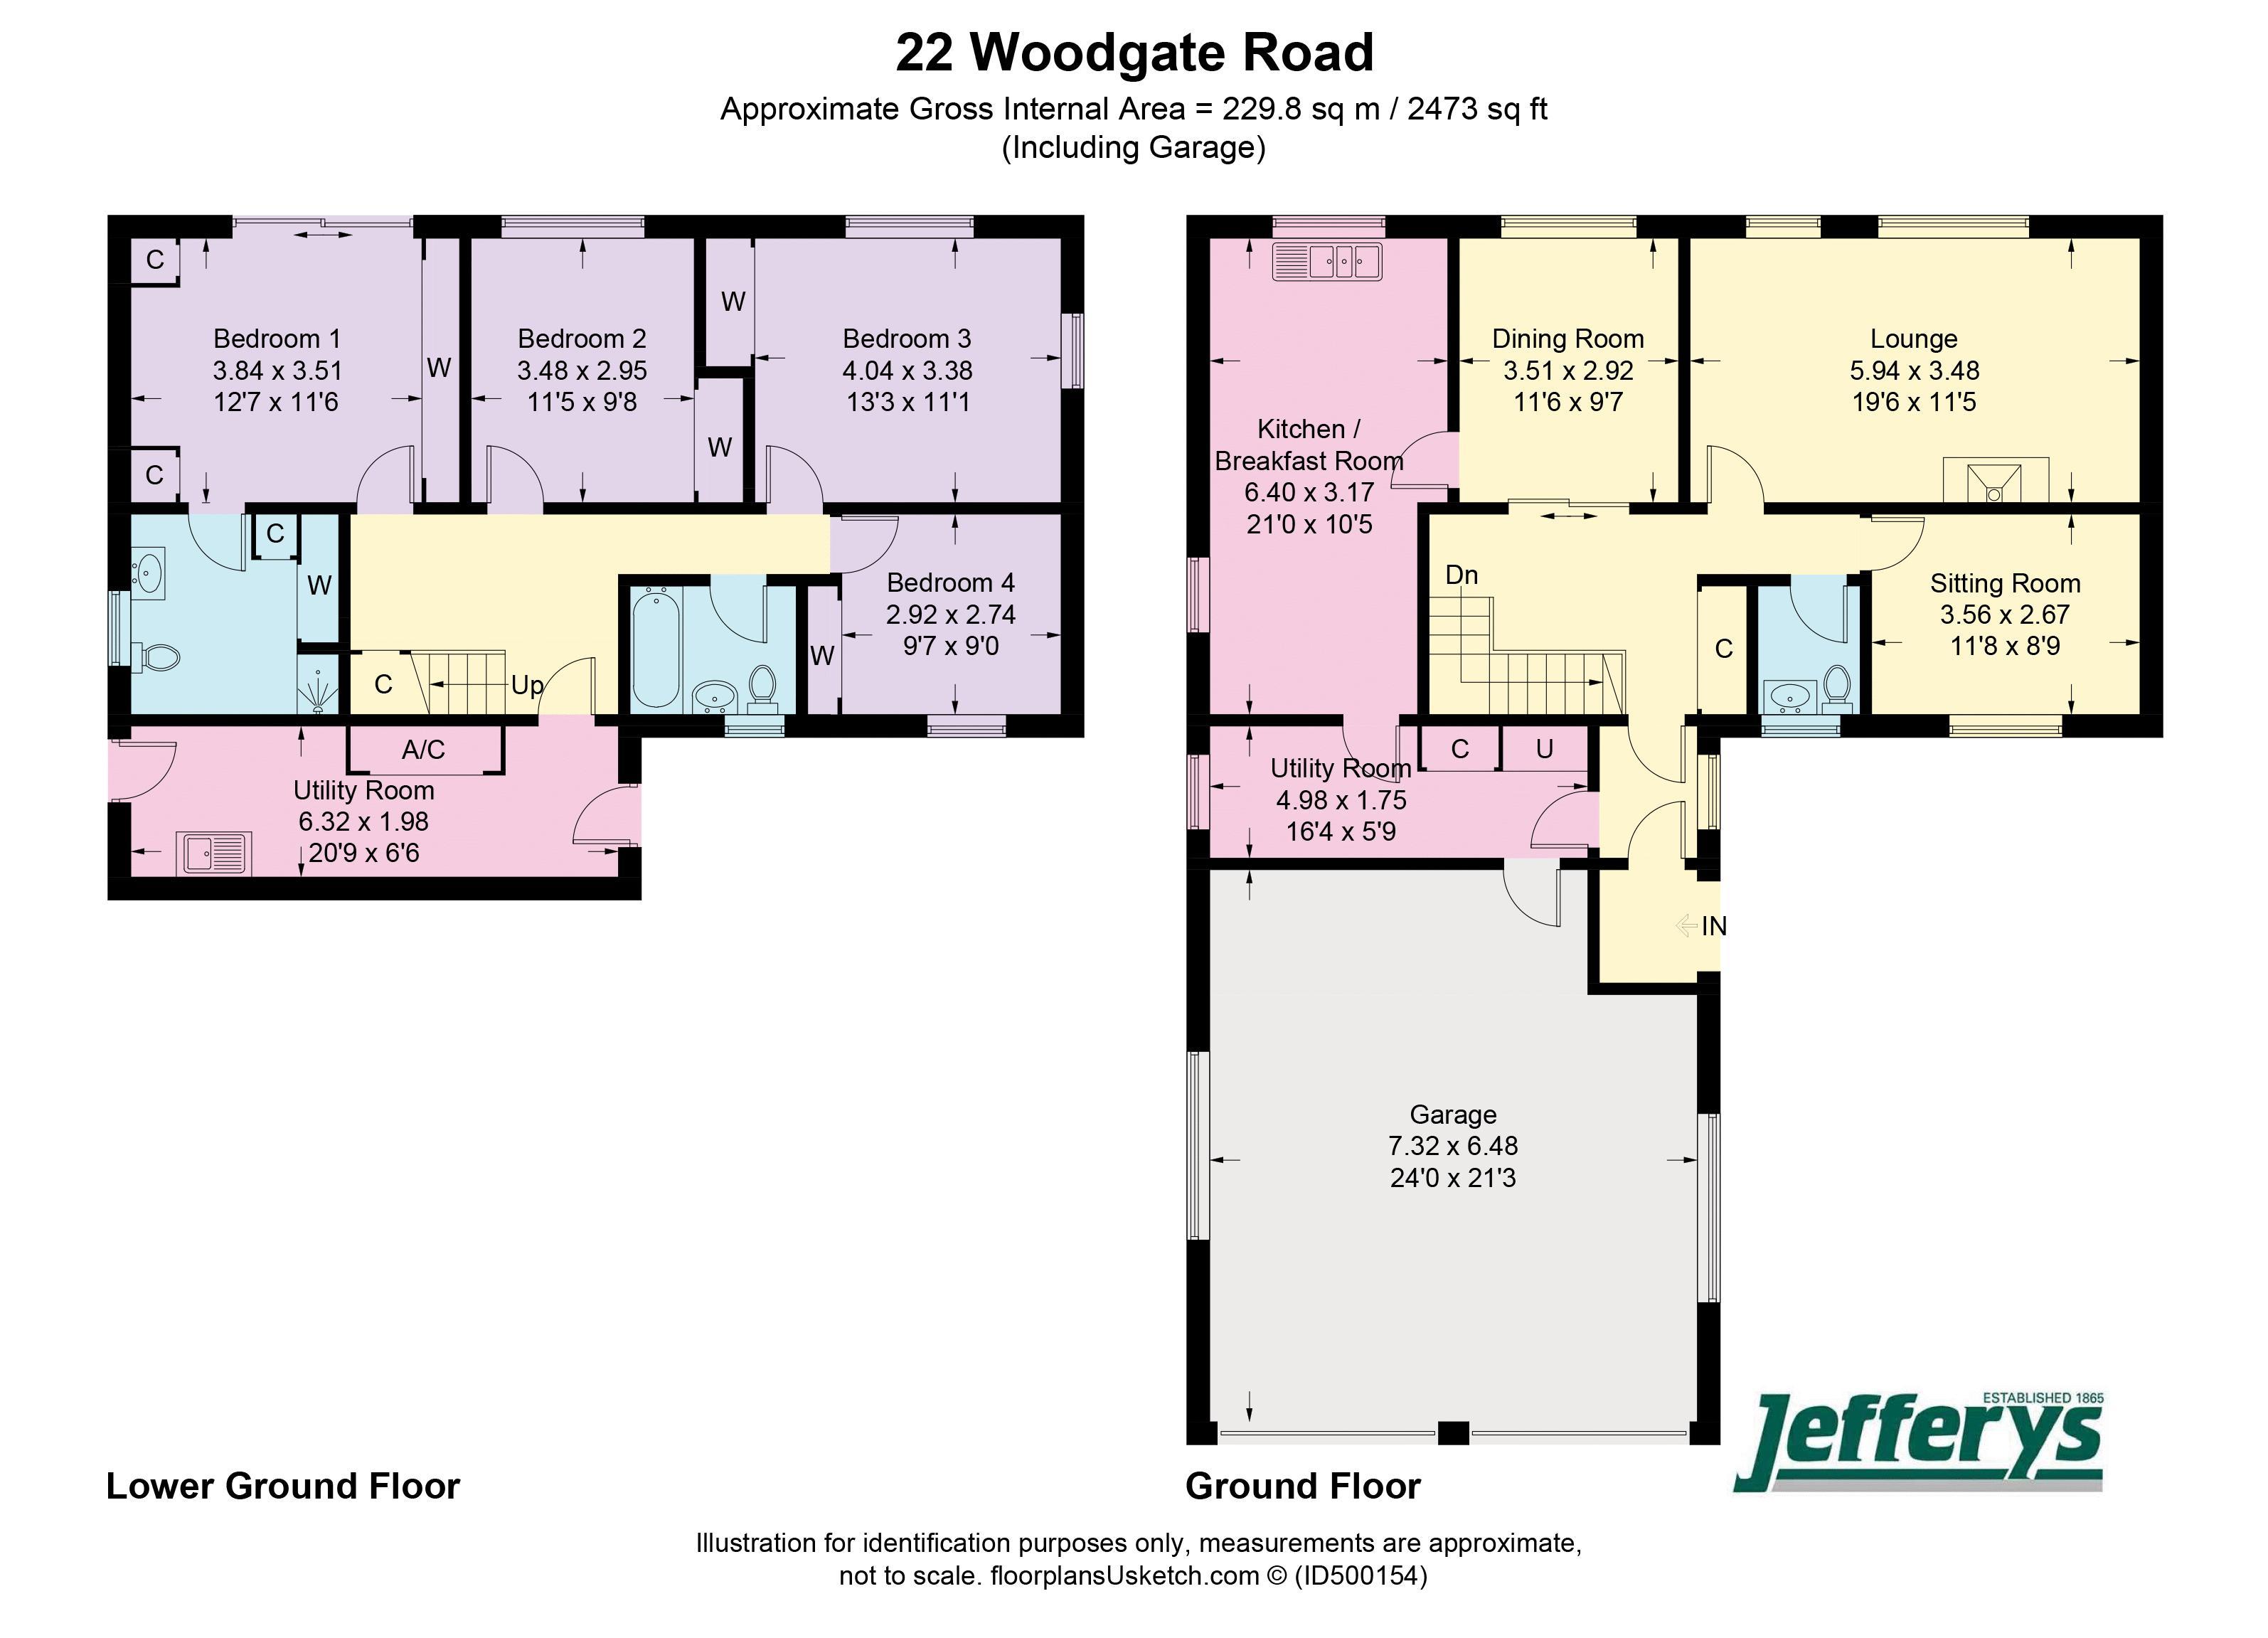 22 Woodgate Road